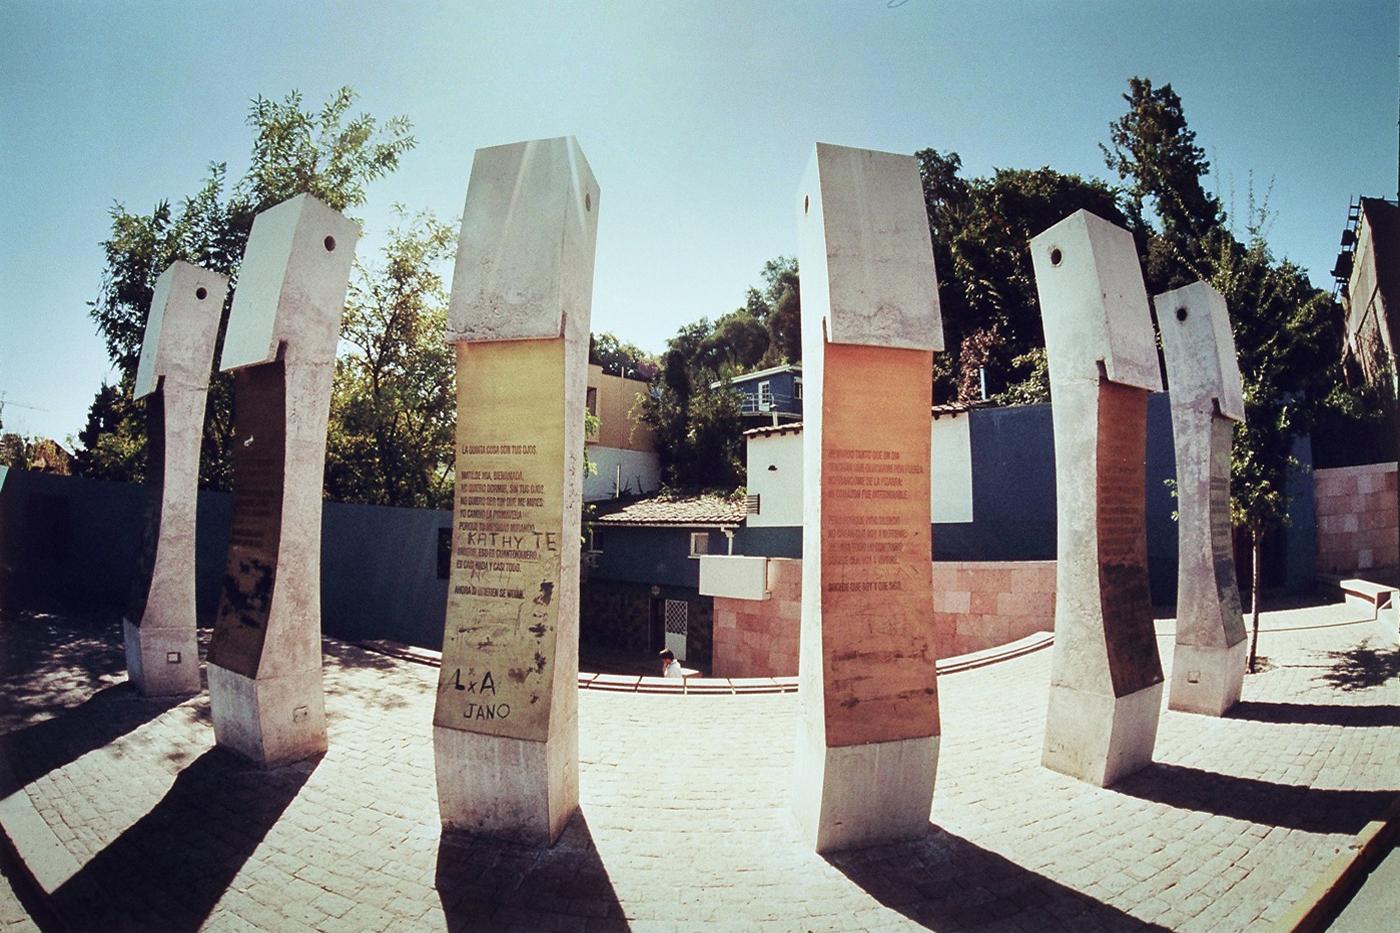 La chascona Santiago de Chile (10)